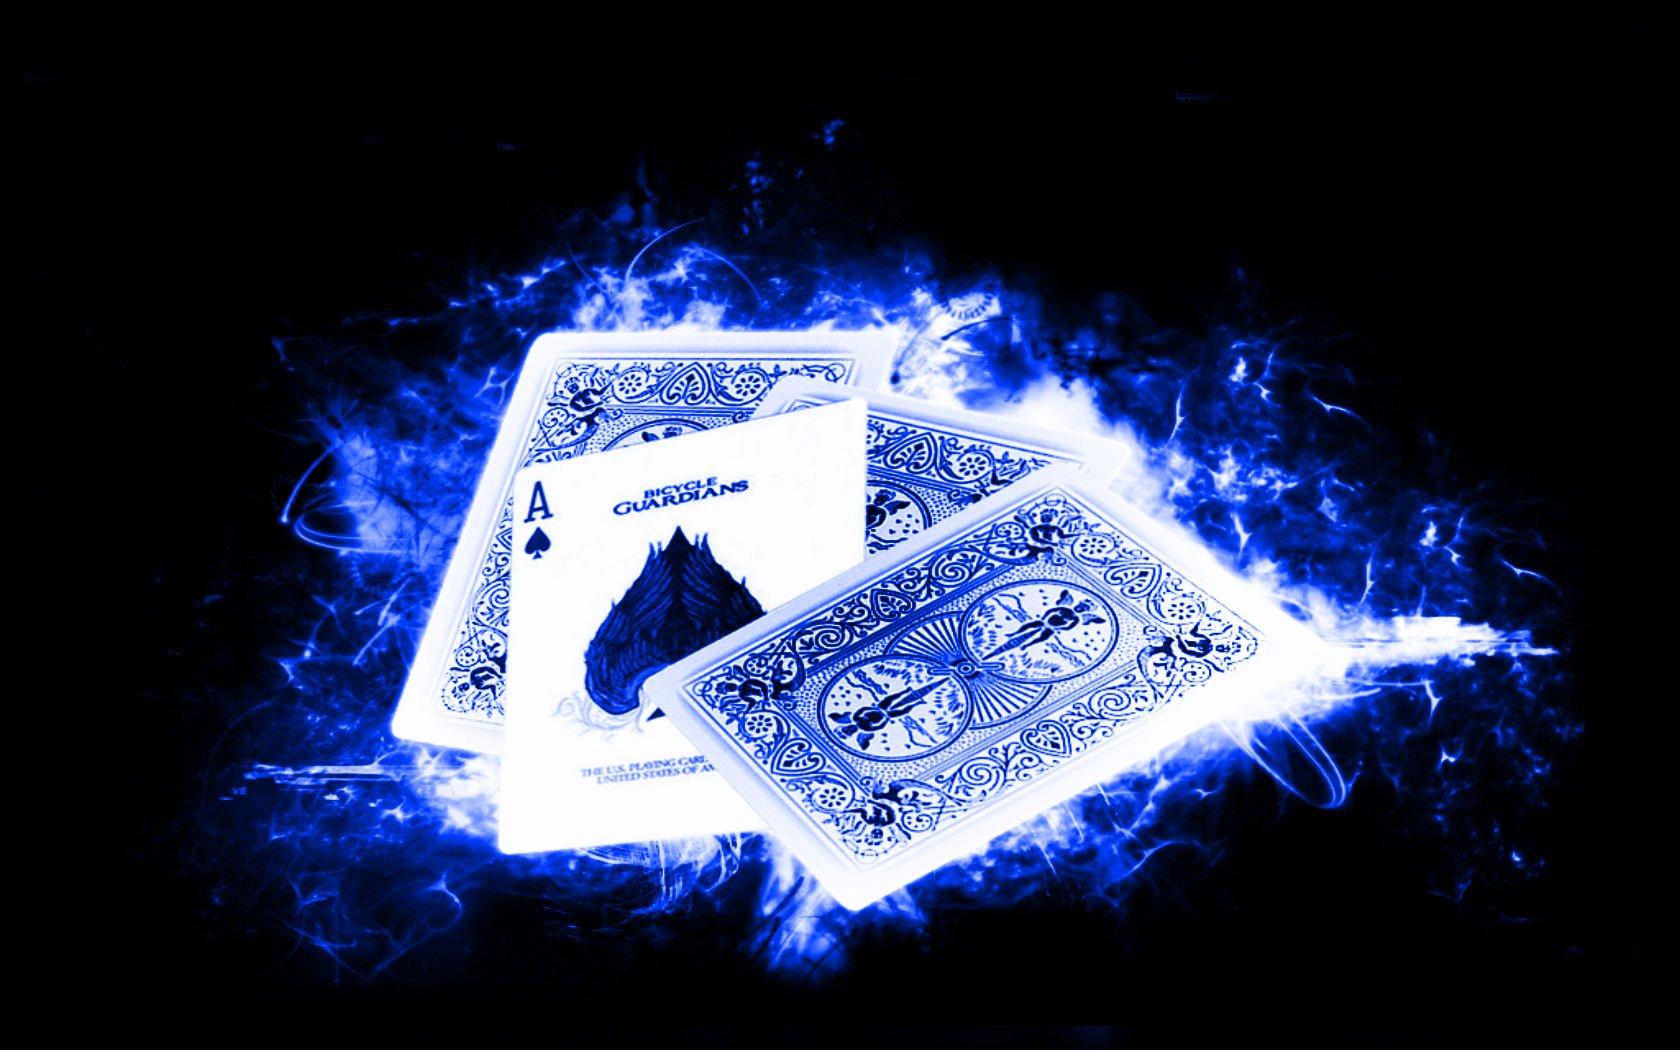 [47+] Poker Cards Wallpaper on WallpaperSafari